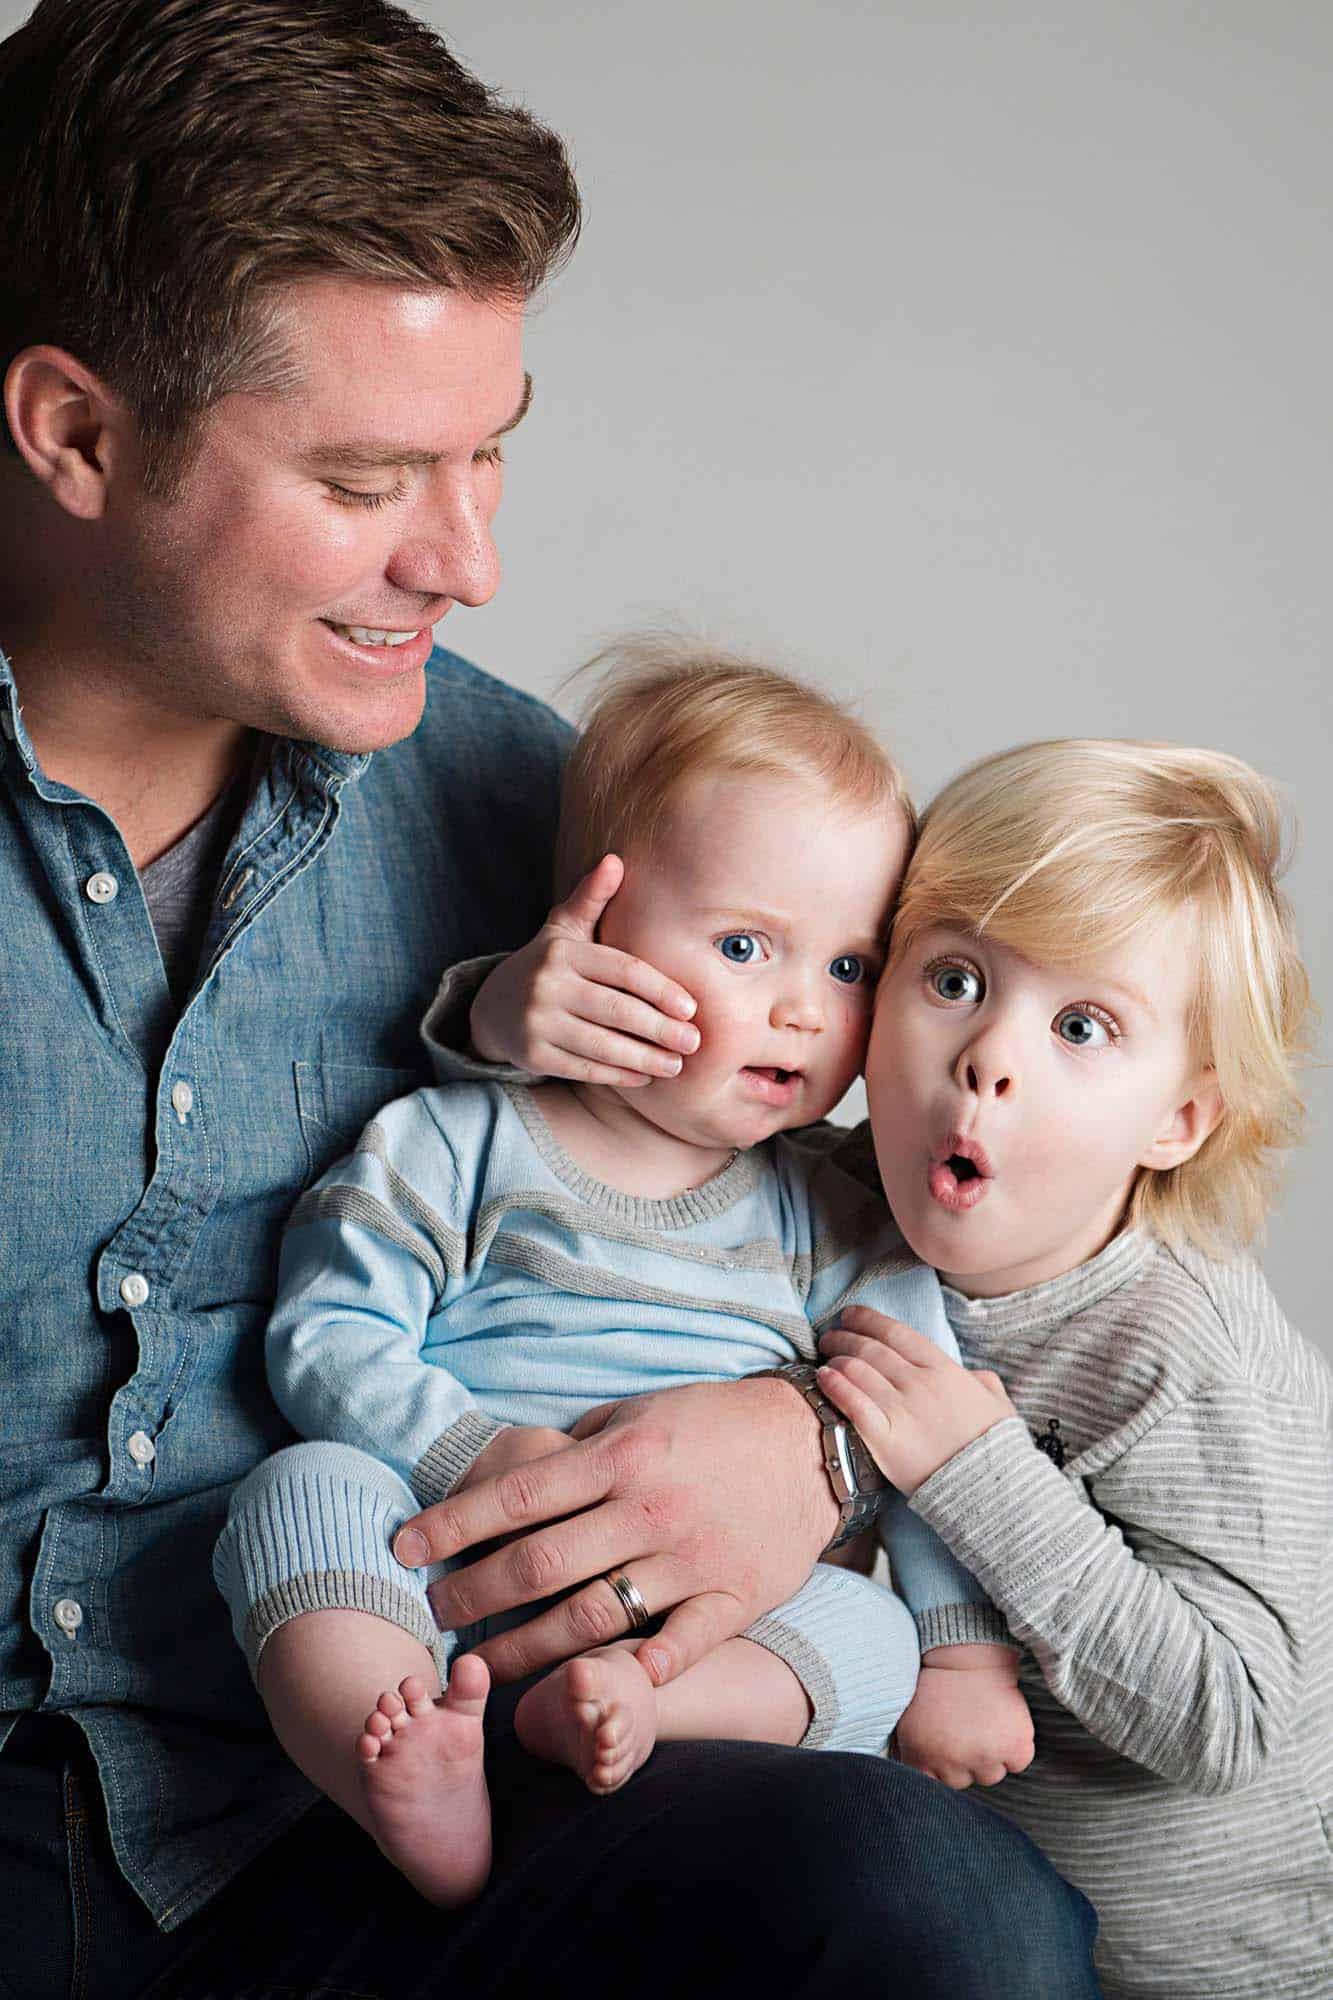 epagaFOTO kansas city documentary photography trending babys first year newborn photoshoot charlie6month010